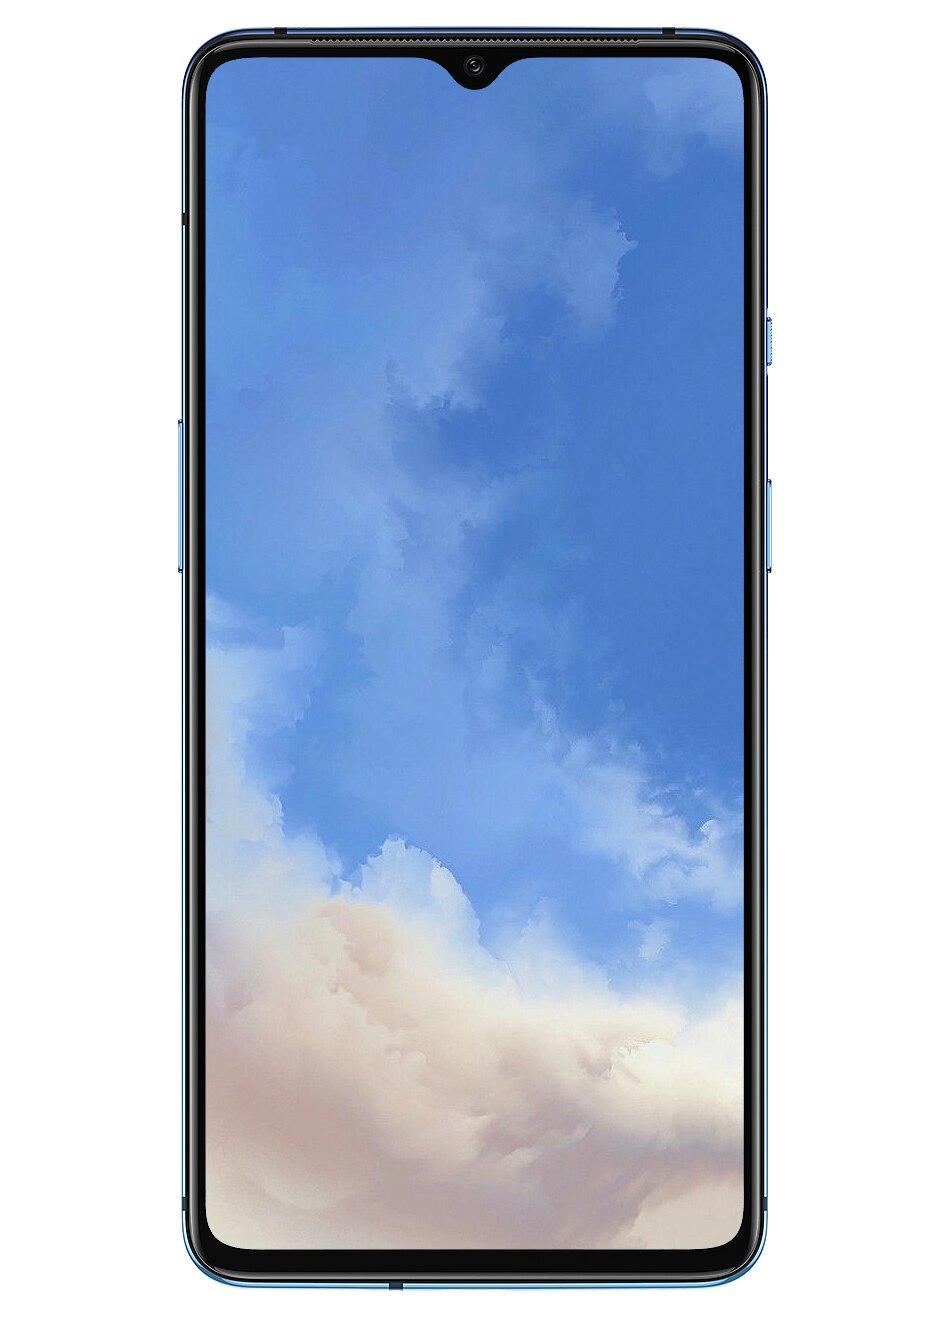 Hc228171528ba42bc834ba6a2185d68596 OnePlus 7T Global Version 8GB 128GB Snapdragon 855 Plus Octa Core 48MP Triple Cameras 90Hz Fulid AMOLED 3800 mAh UFS 3.0 NFC